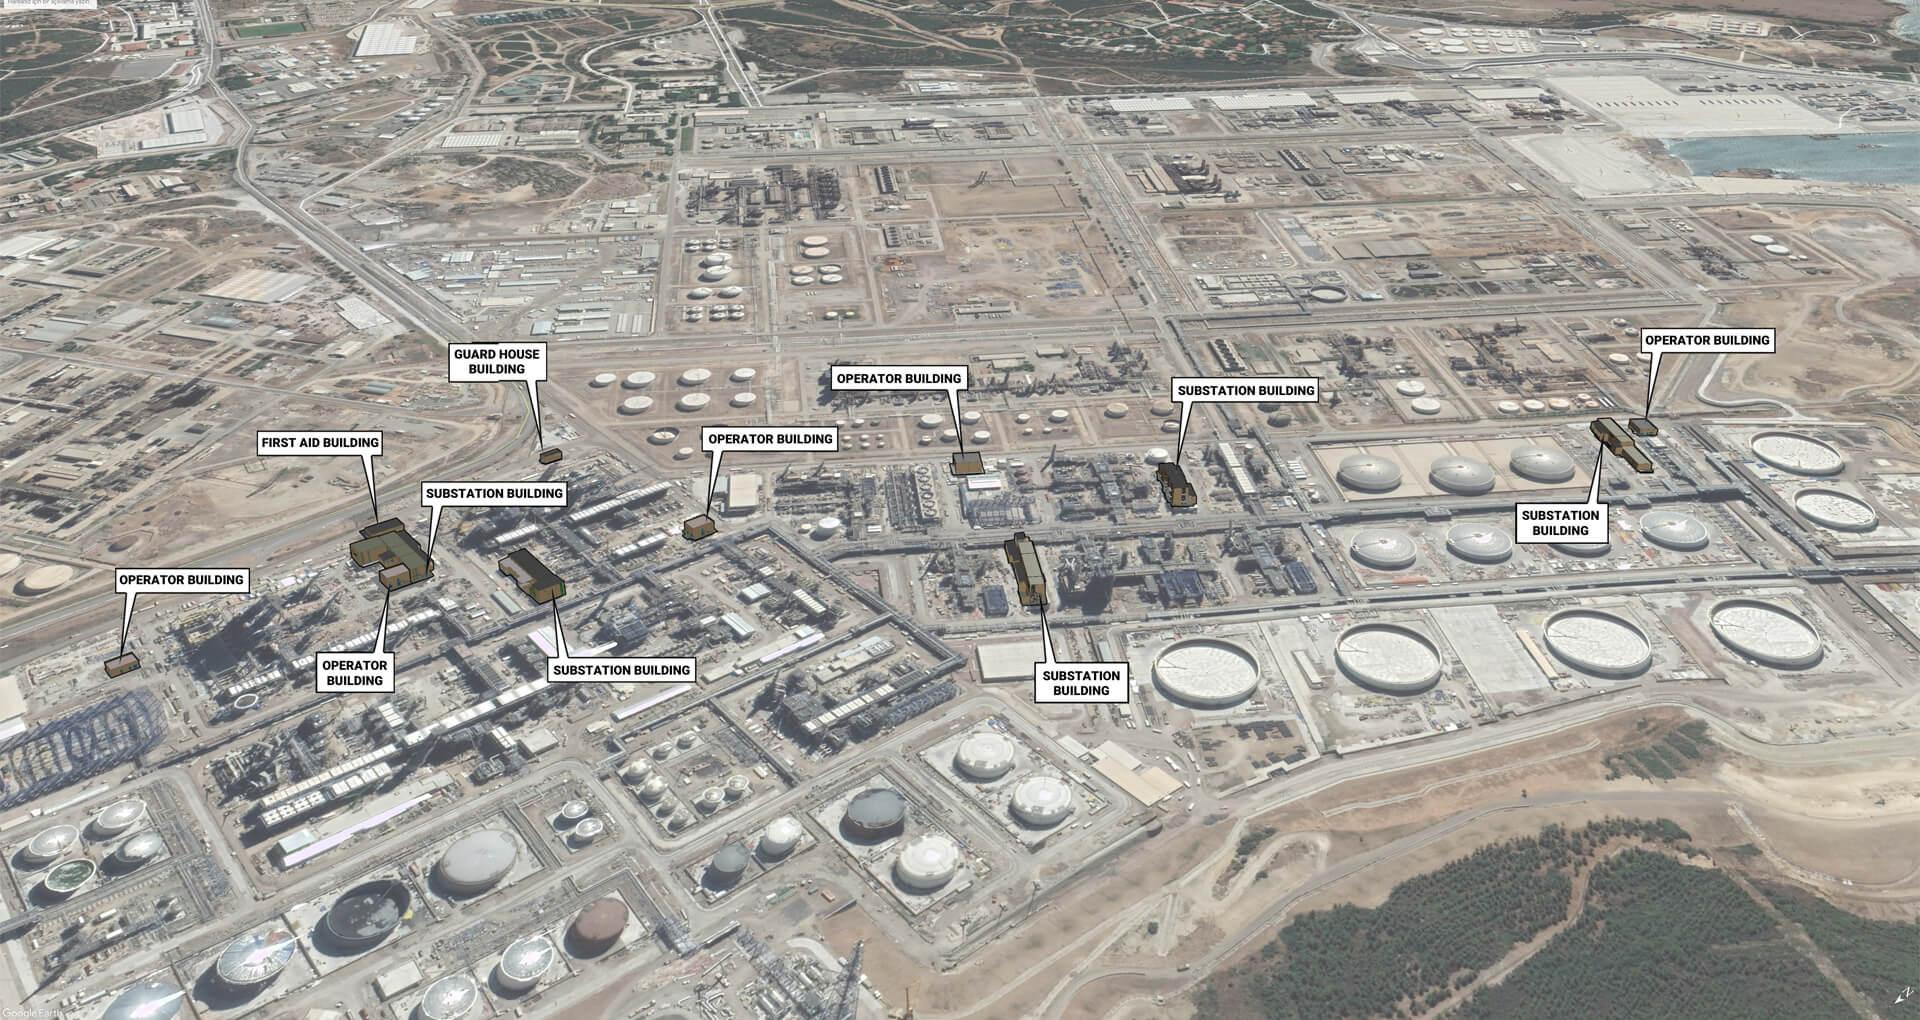 Star Oil Refinery